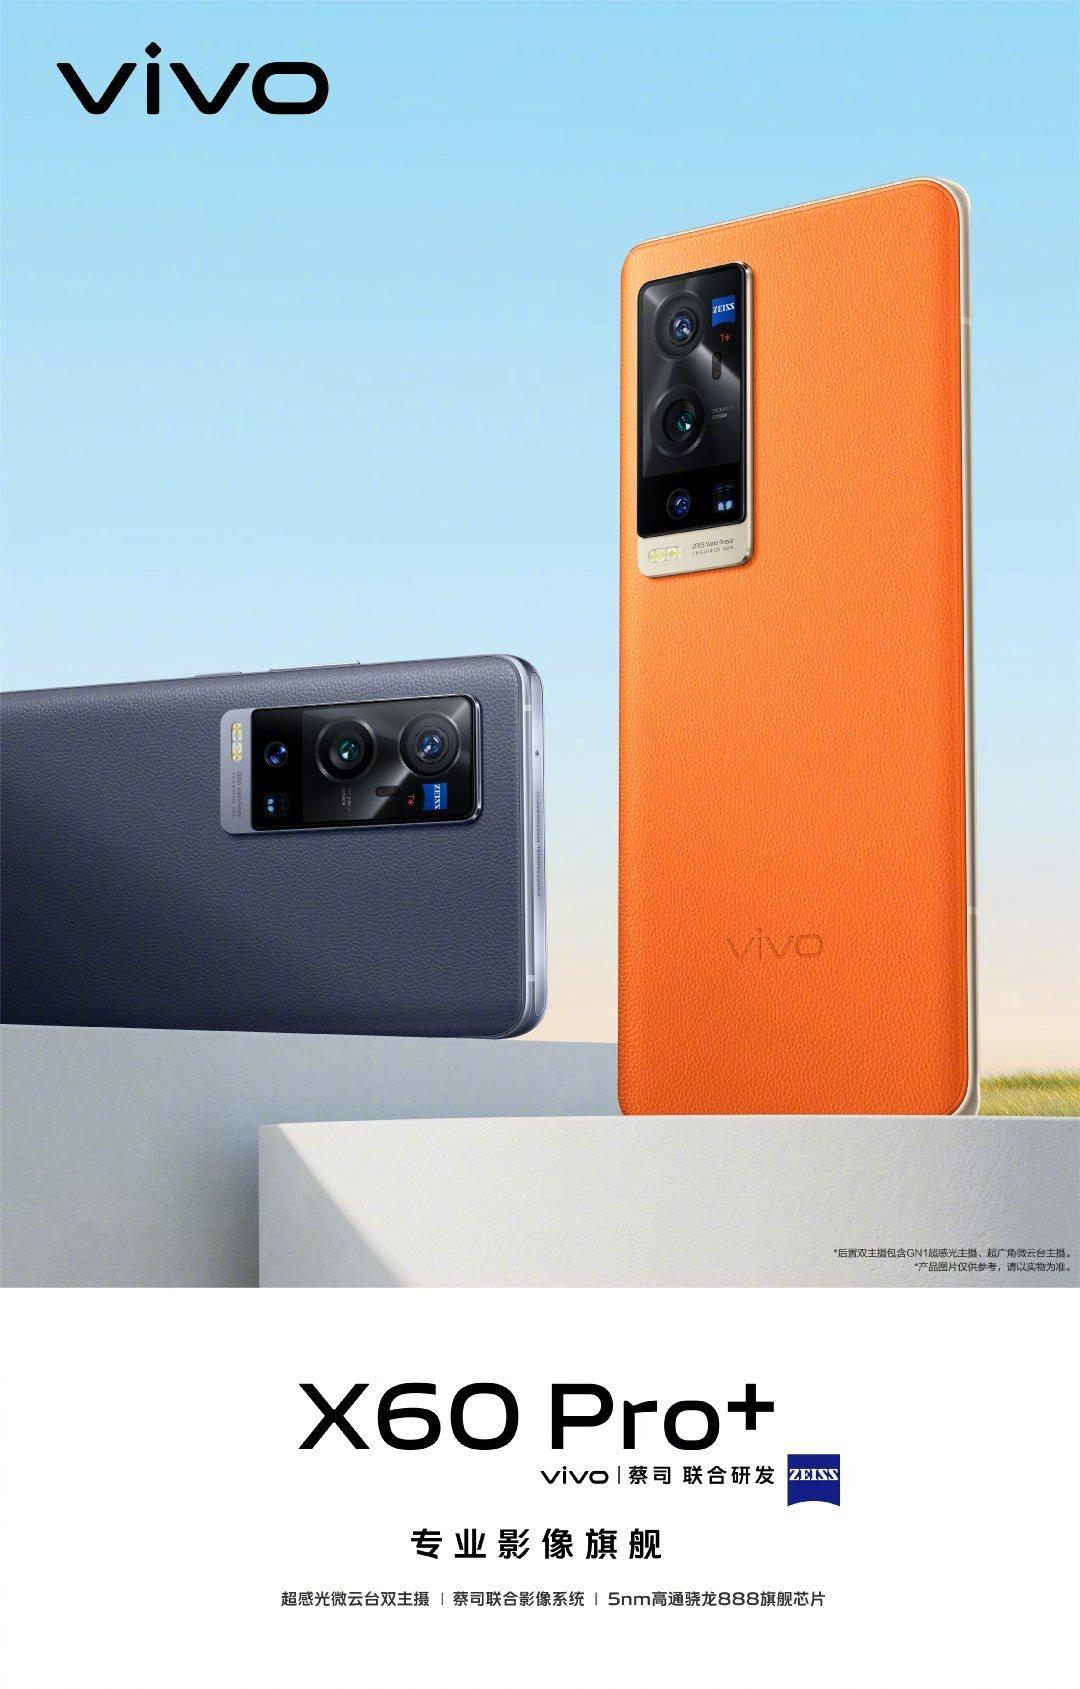 vivo X60 Pro+ 背部设计公布:搭载超感光微云台双主摄 - 热点资讯 家电百科 第2张